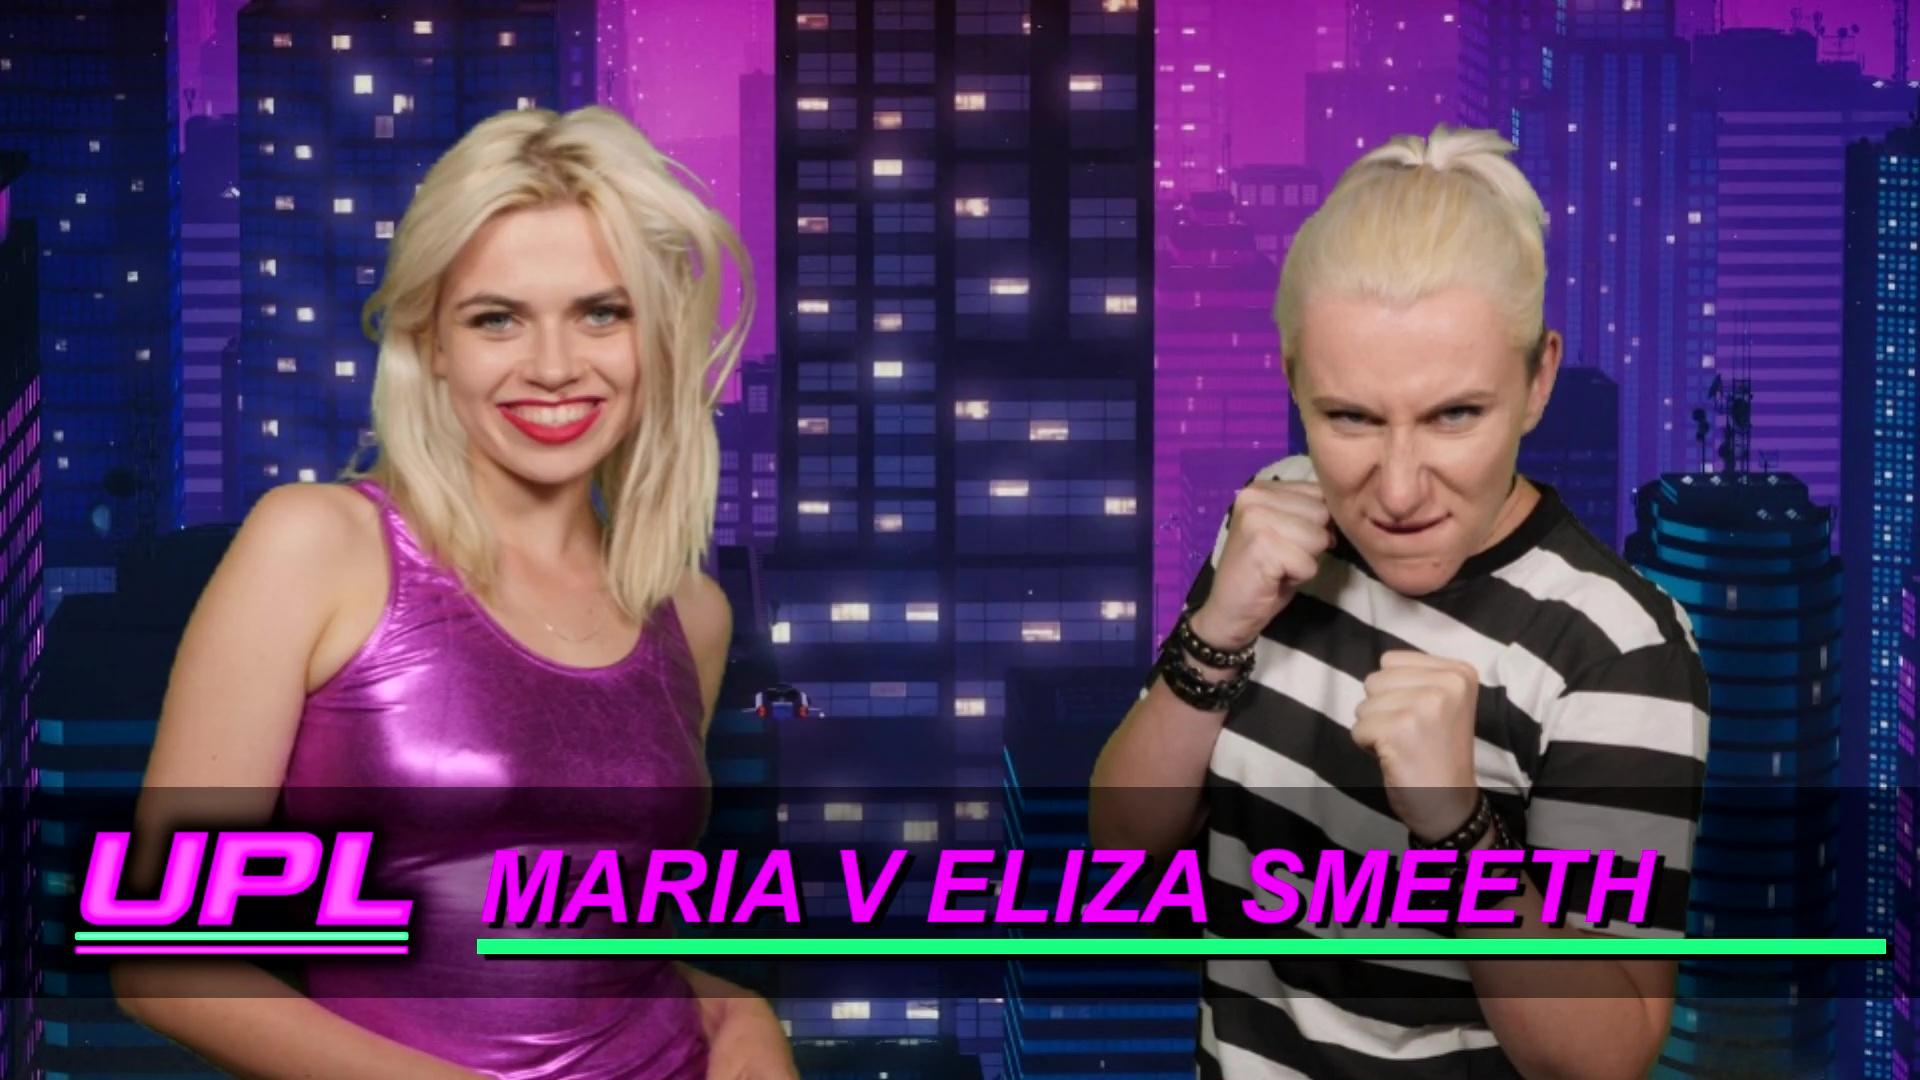 OUT NOW! UPL 4: Maria v Eliza